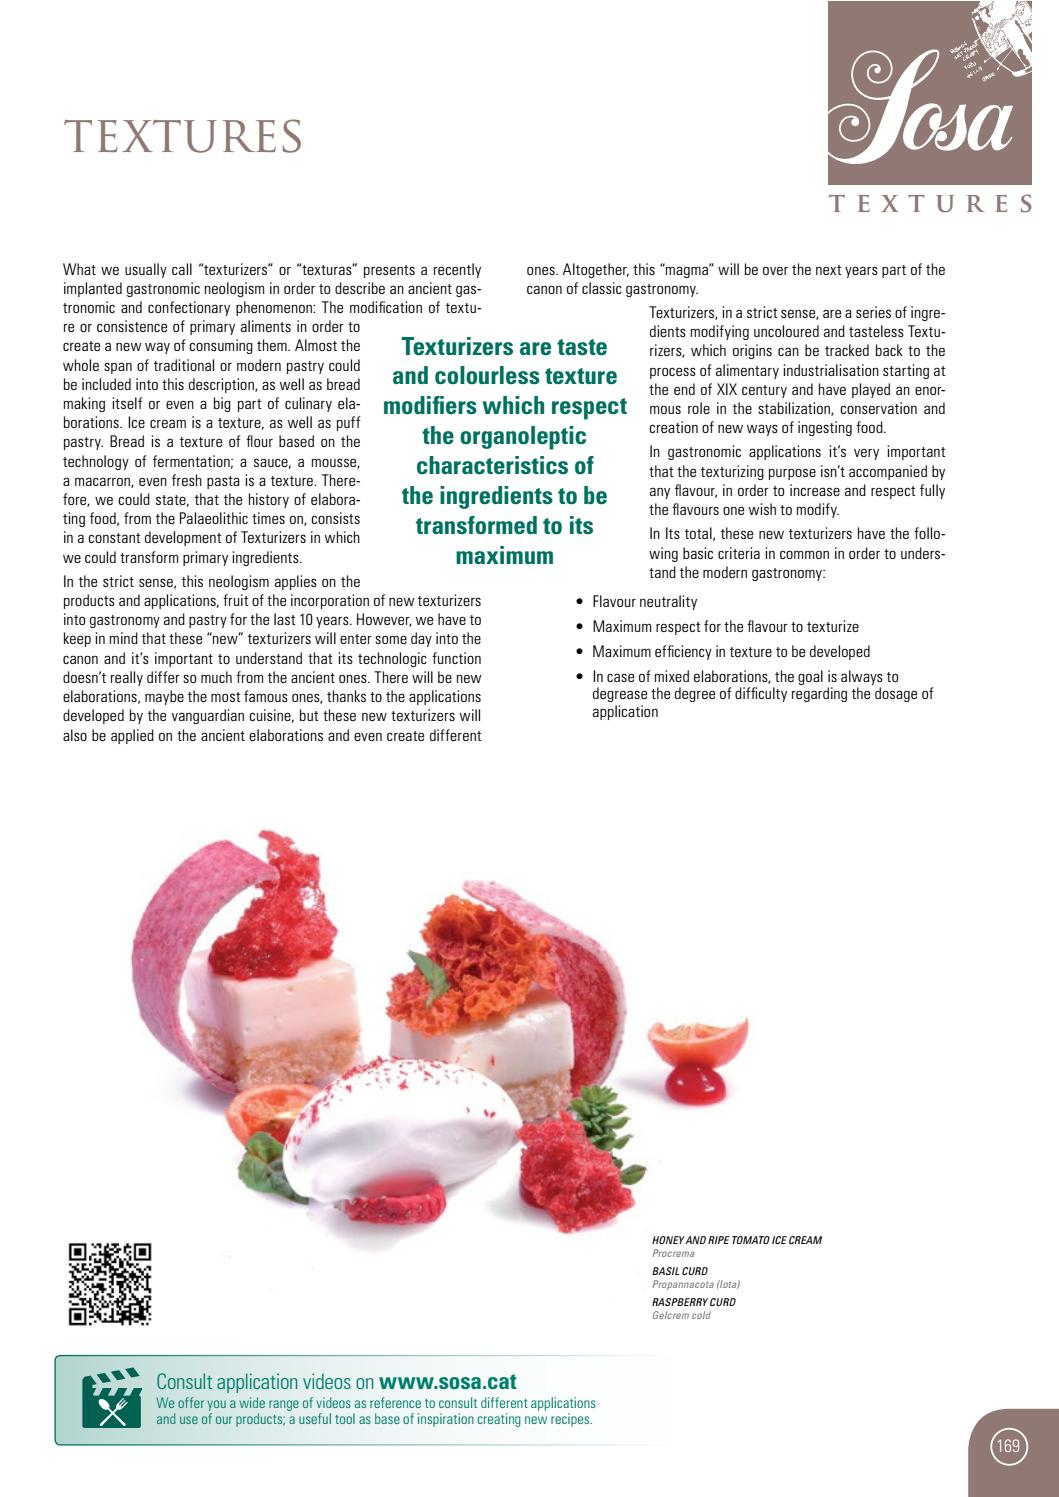 Sosa Ingredients Food Service 2017 (ENG) by Sosa Ingredients, SL - issuu